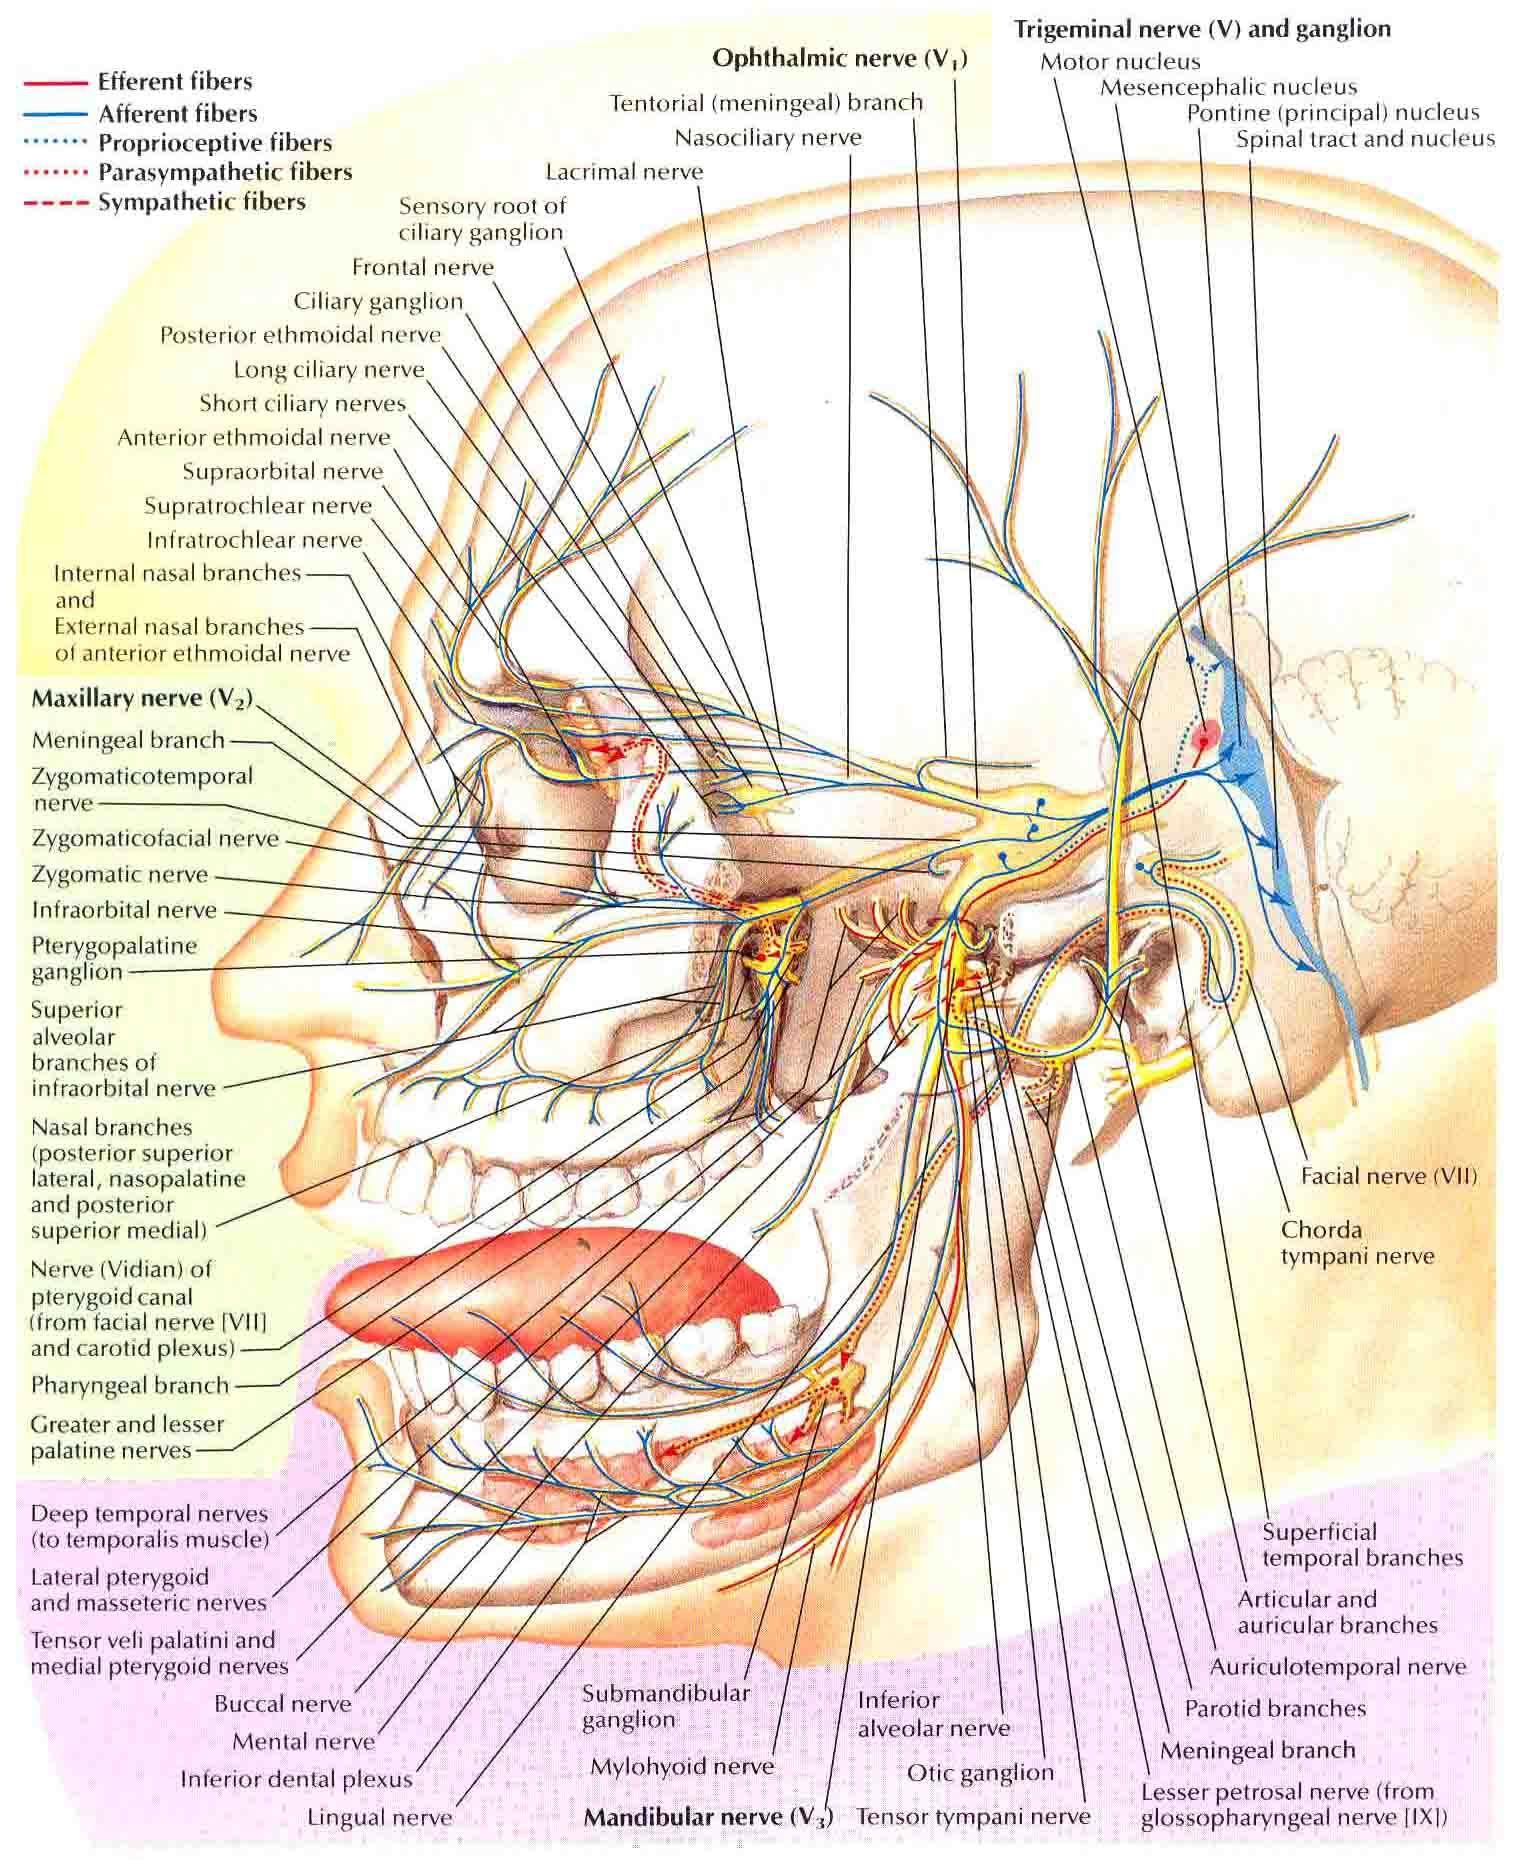 Trigeminal Nerve-Schema | Pain d'epices, On and Trigeminal neuralgia